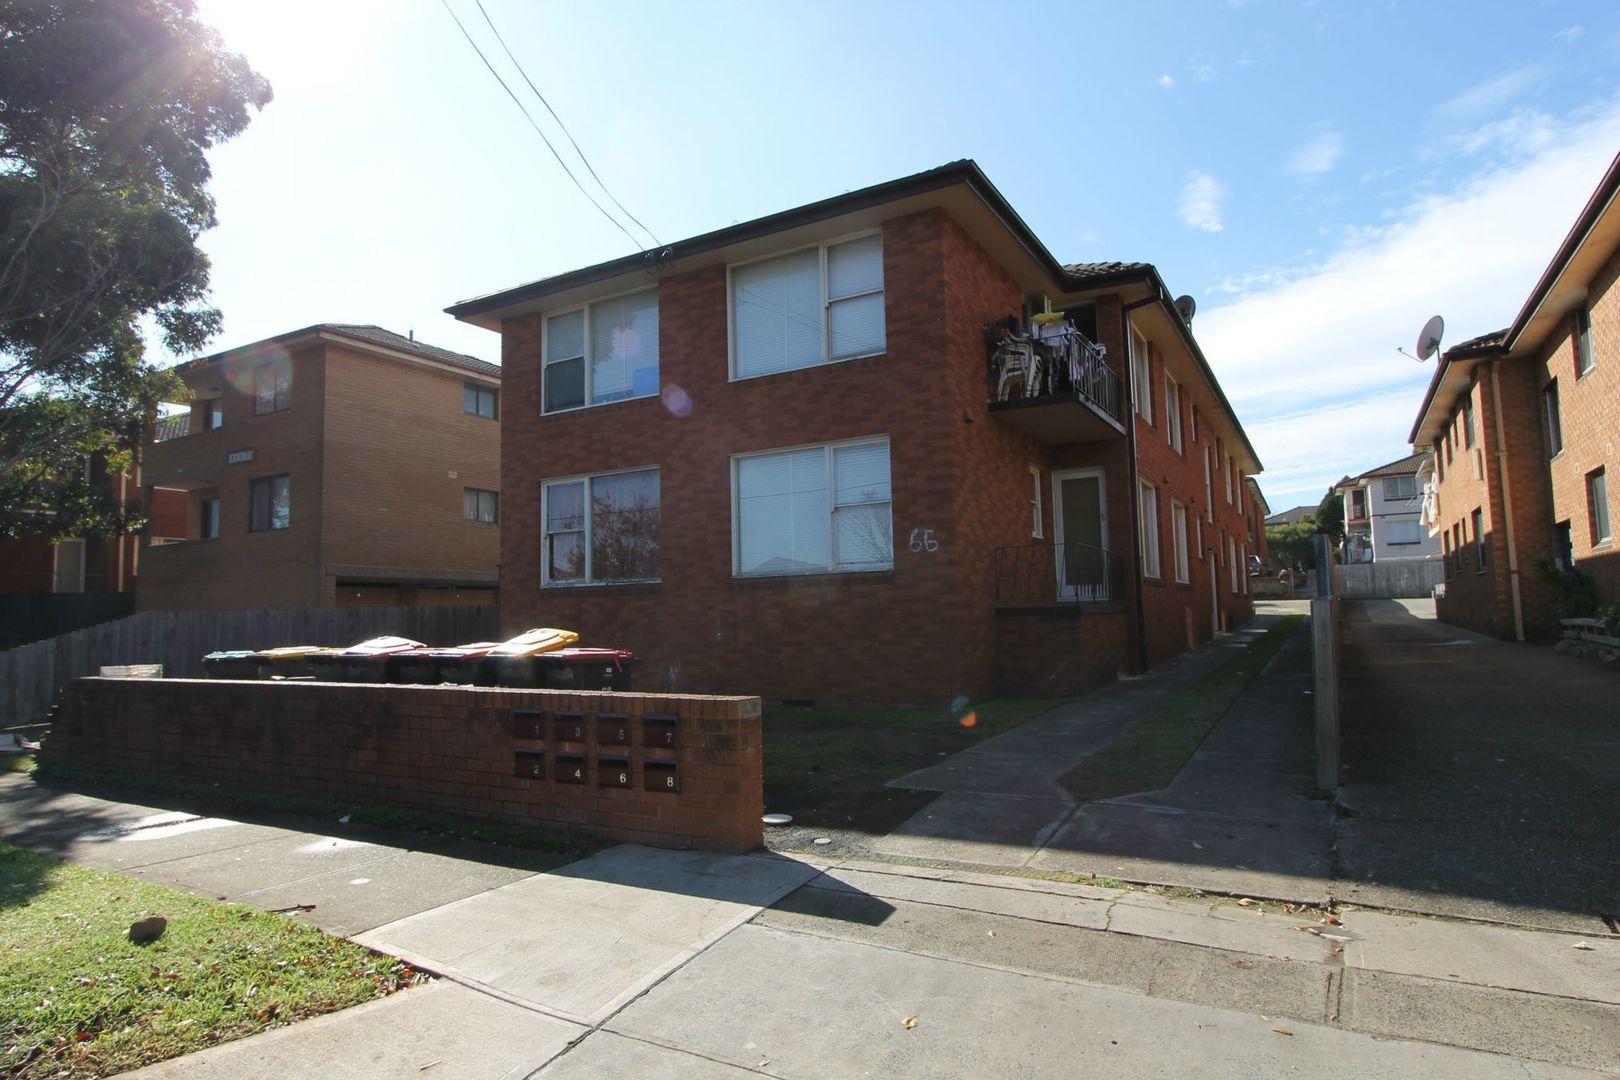 2/66 Ferguson Avenue, Wiley Park NSW 2195, Image 0